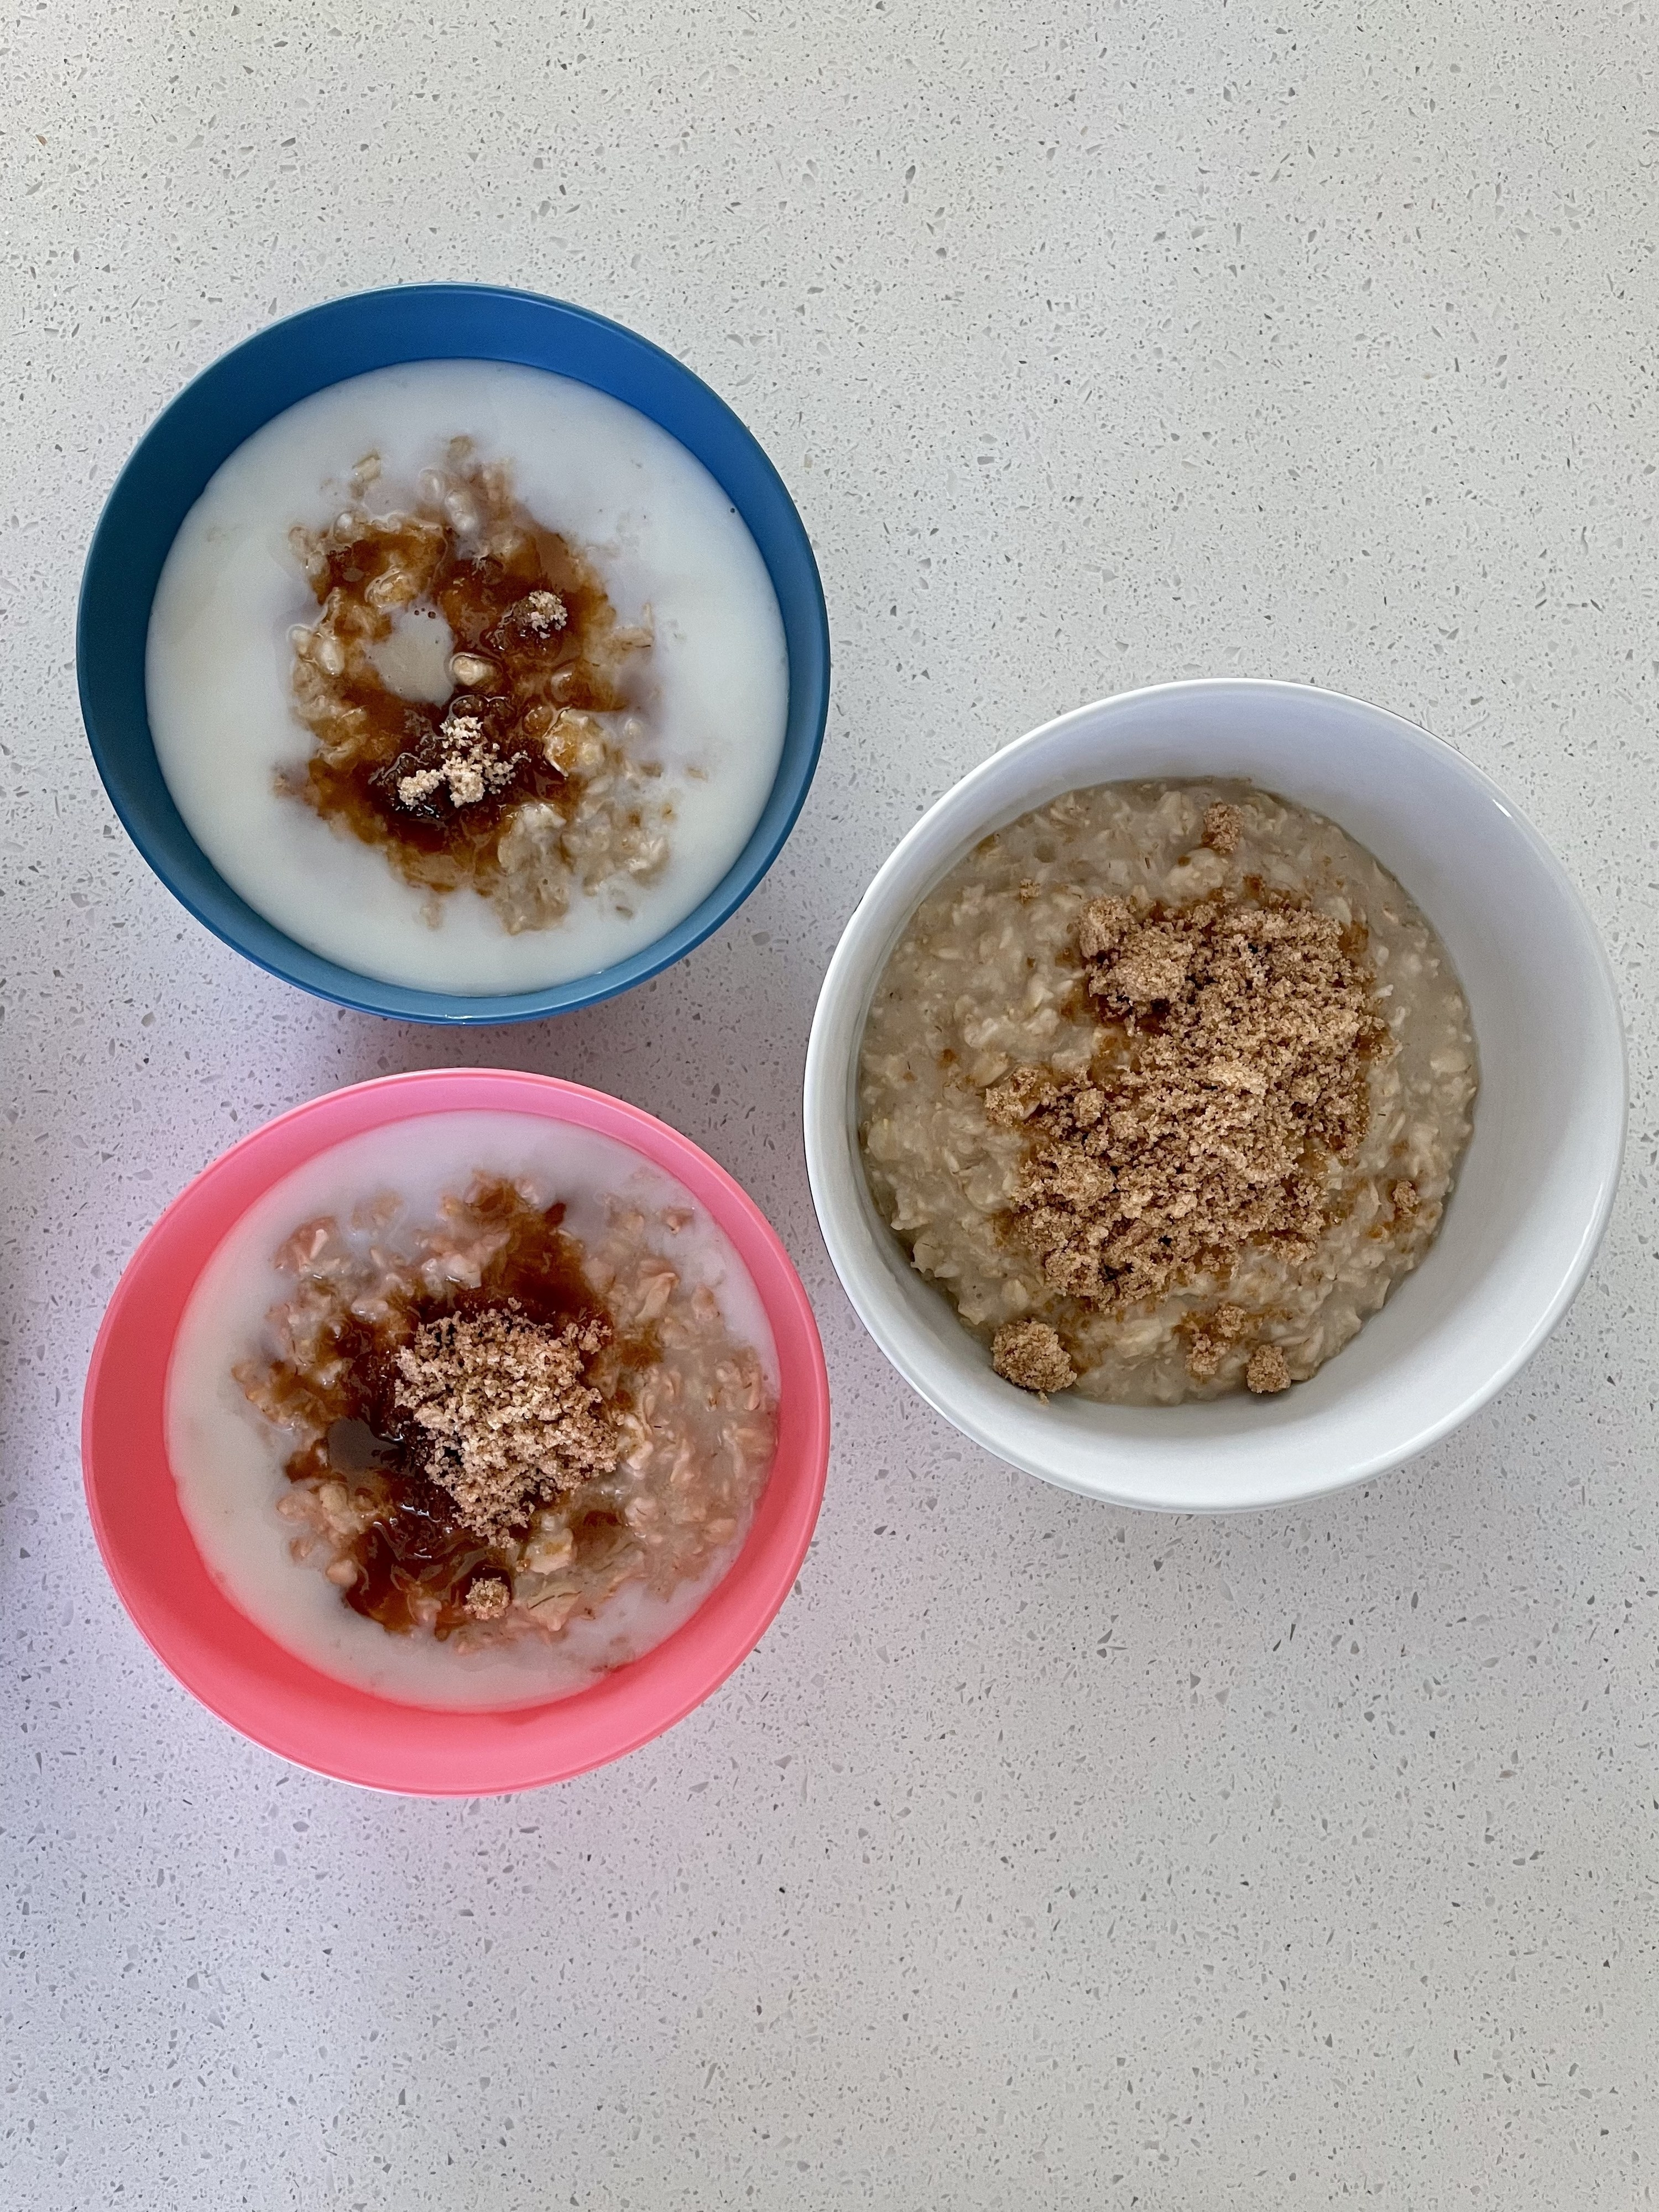 Three bowls of oatmeal